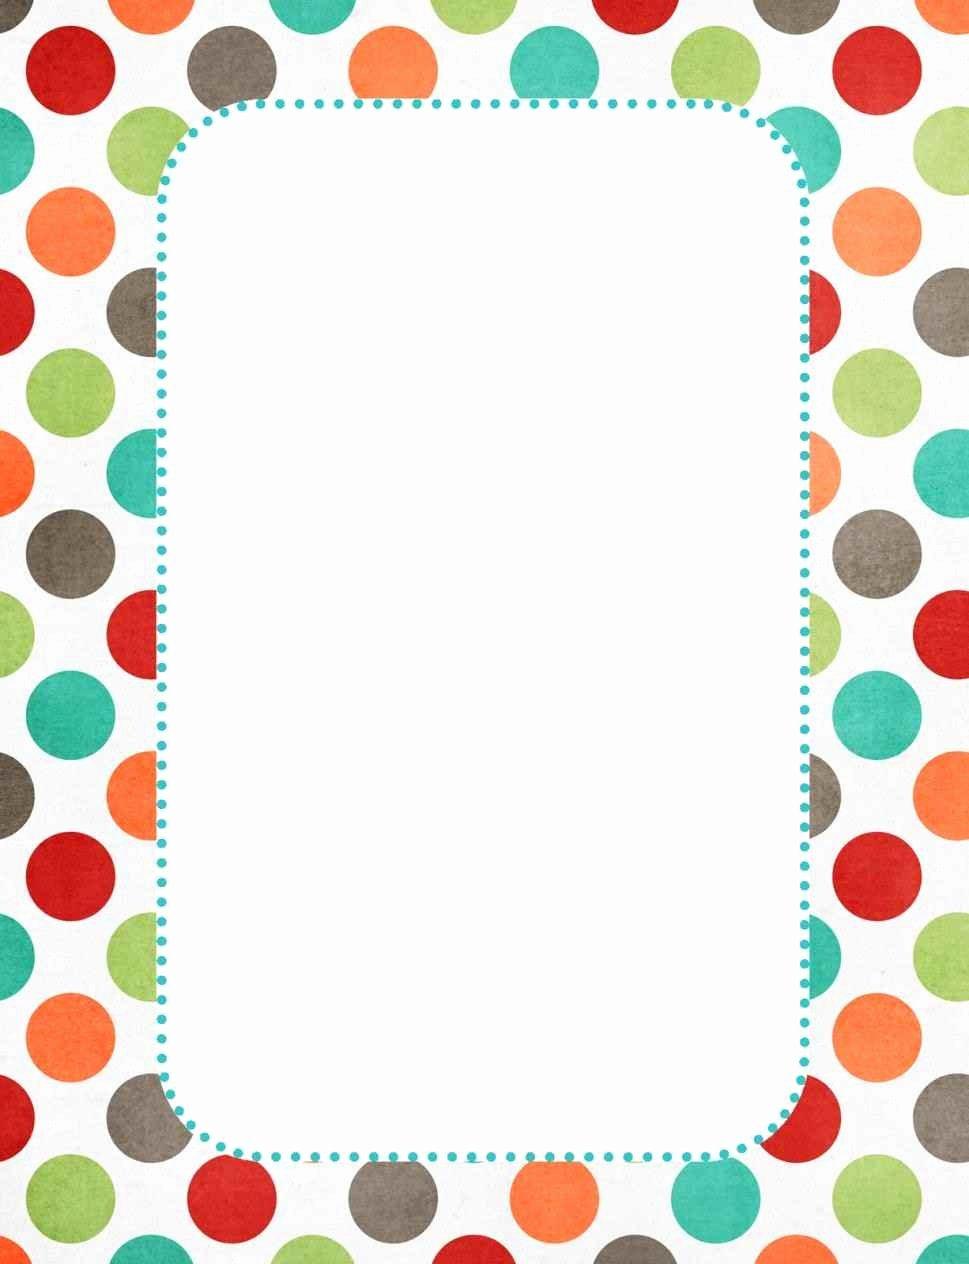 Preschool Borders for Word Fresh Cute Borders for Paper Template Update234 Template